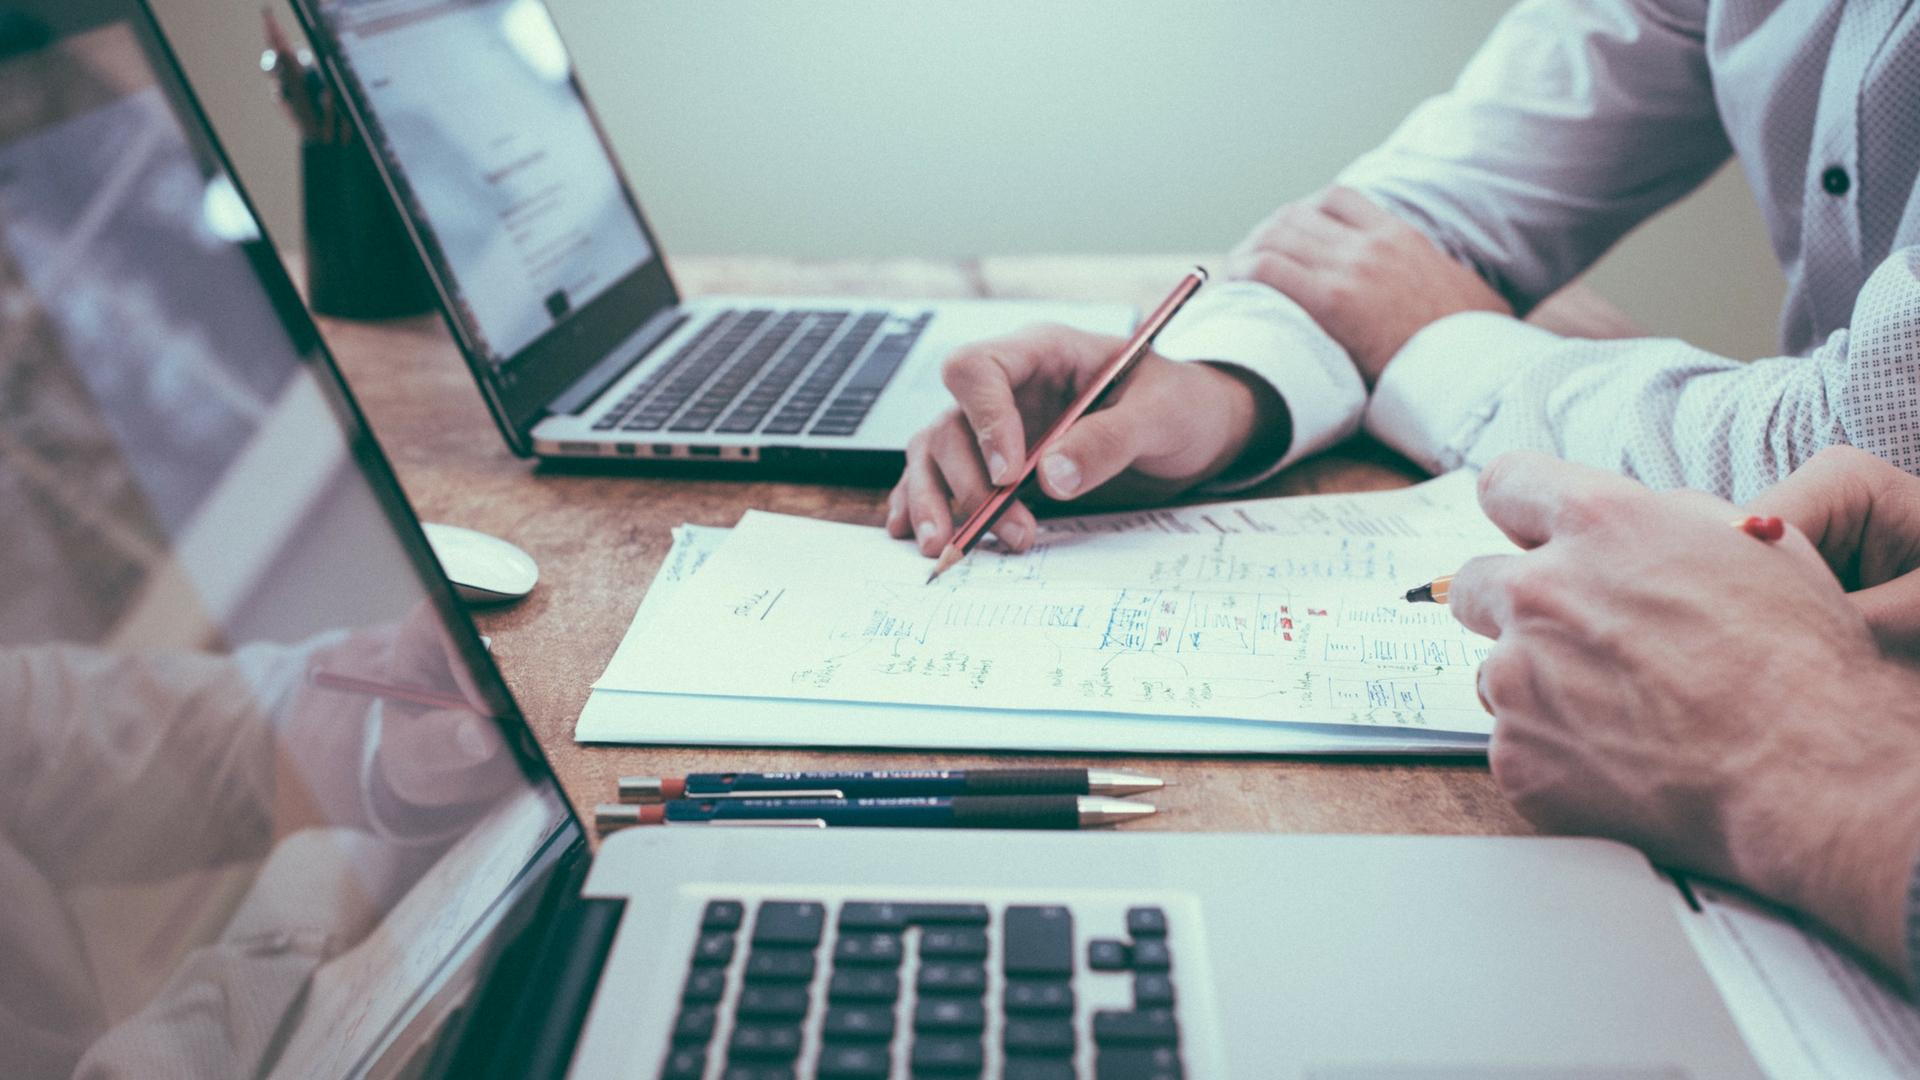 <p>Στο blog της Motive Συμβουλευτικής αναρτώνται άρθρα σχετικά με τους τομείς που η εταιρία δραστηριοποιείται, όπως: το σύστημα διαχείρισης ποιότητας ISO, επενδυτικά προγράμματα, μελέτες, εκπαίδευση και σεμινάρια. Μεταβείτε στο blog […]</p>